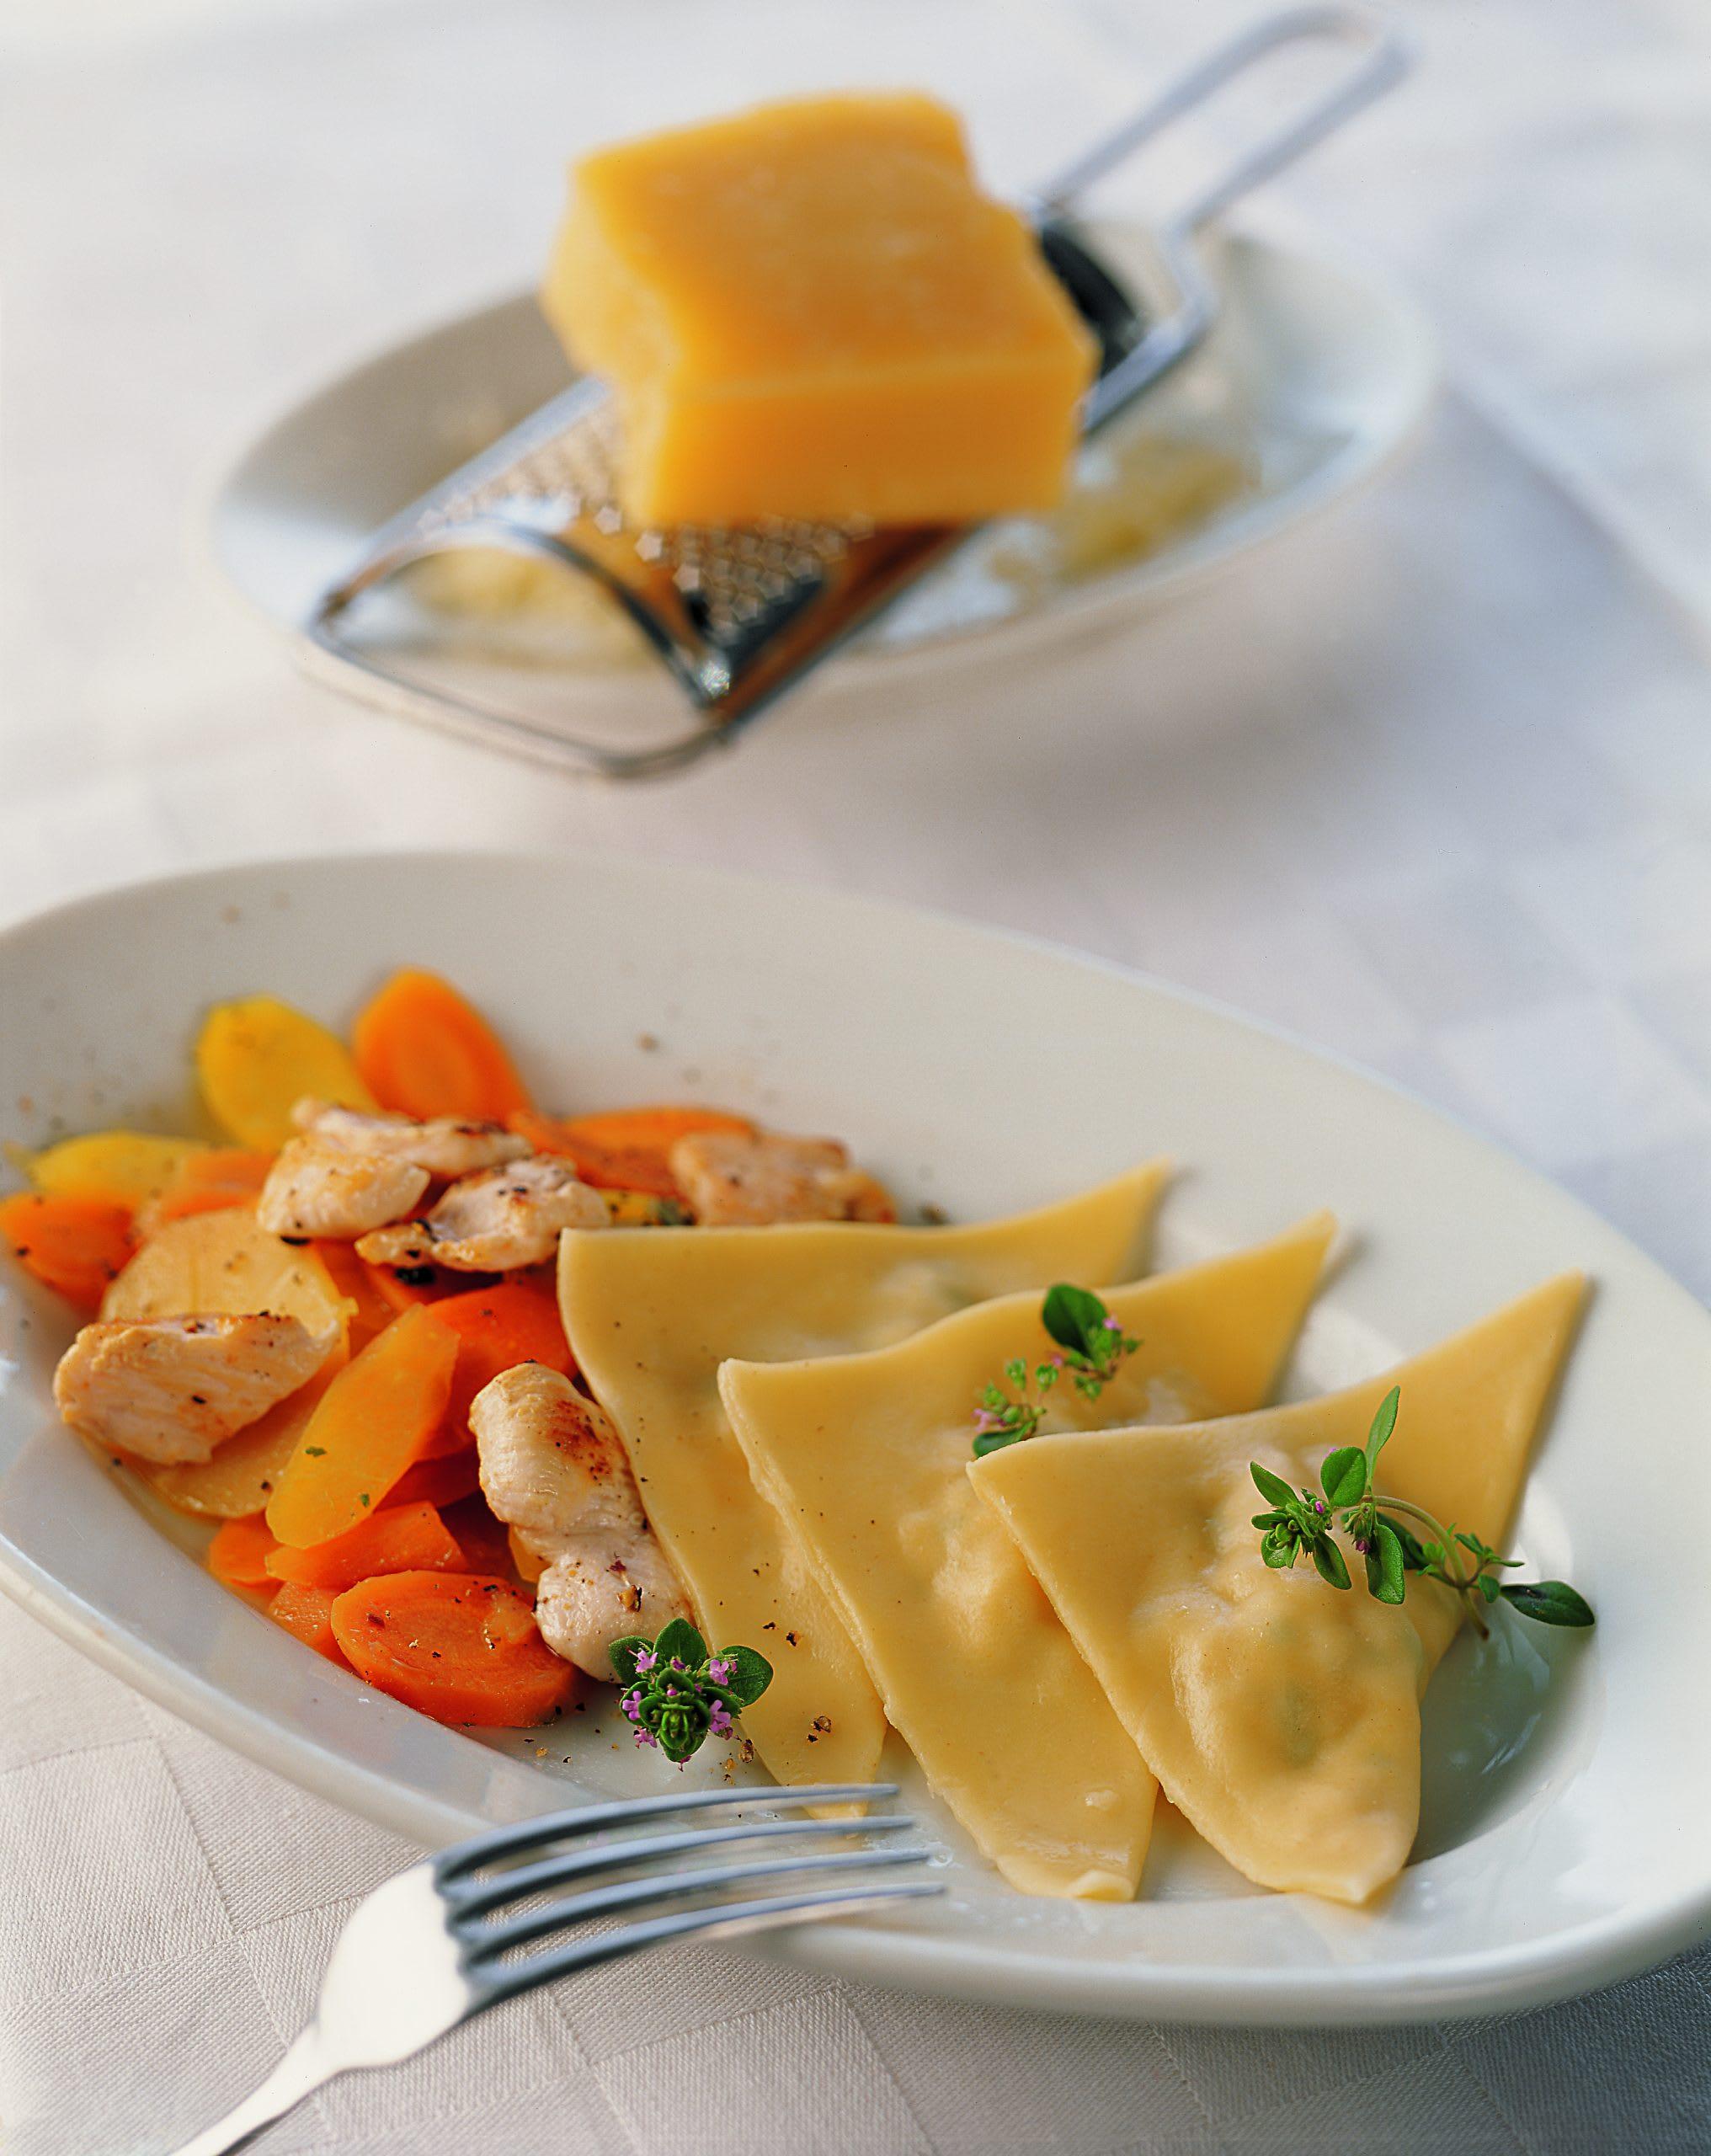 Poulet-Triangoli auf Gemüsebeet